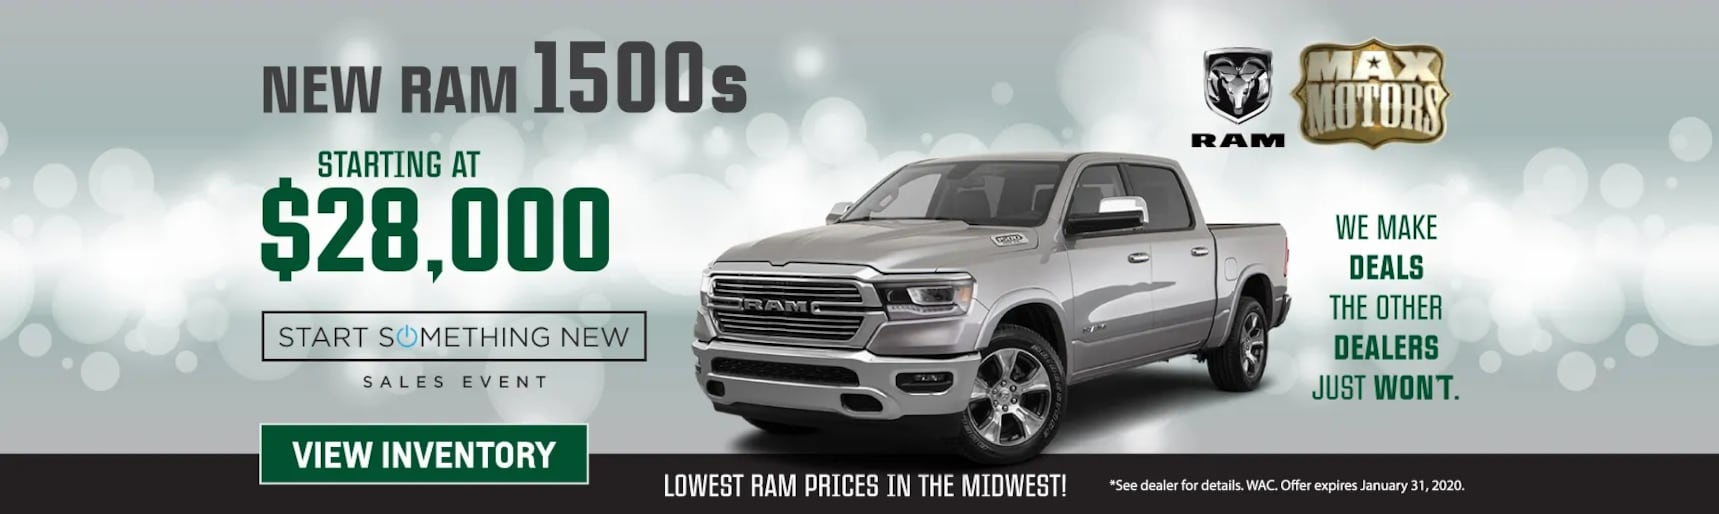 Max Motor Dreams Price >> Max Chrysler Jeep Dodge New Chrysler Dodge Jeep Ram